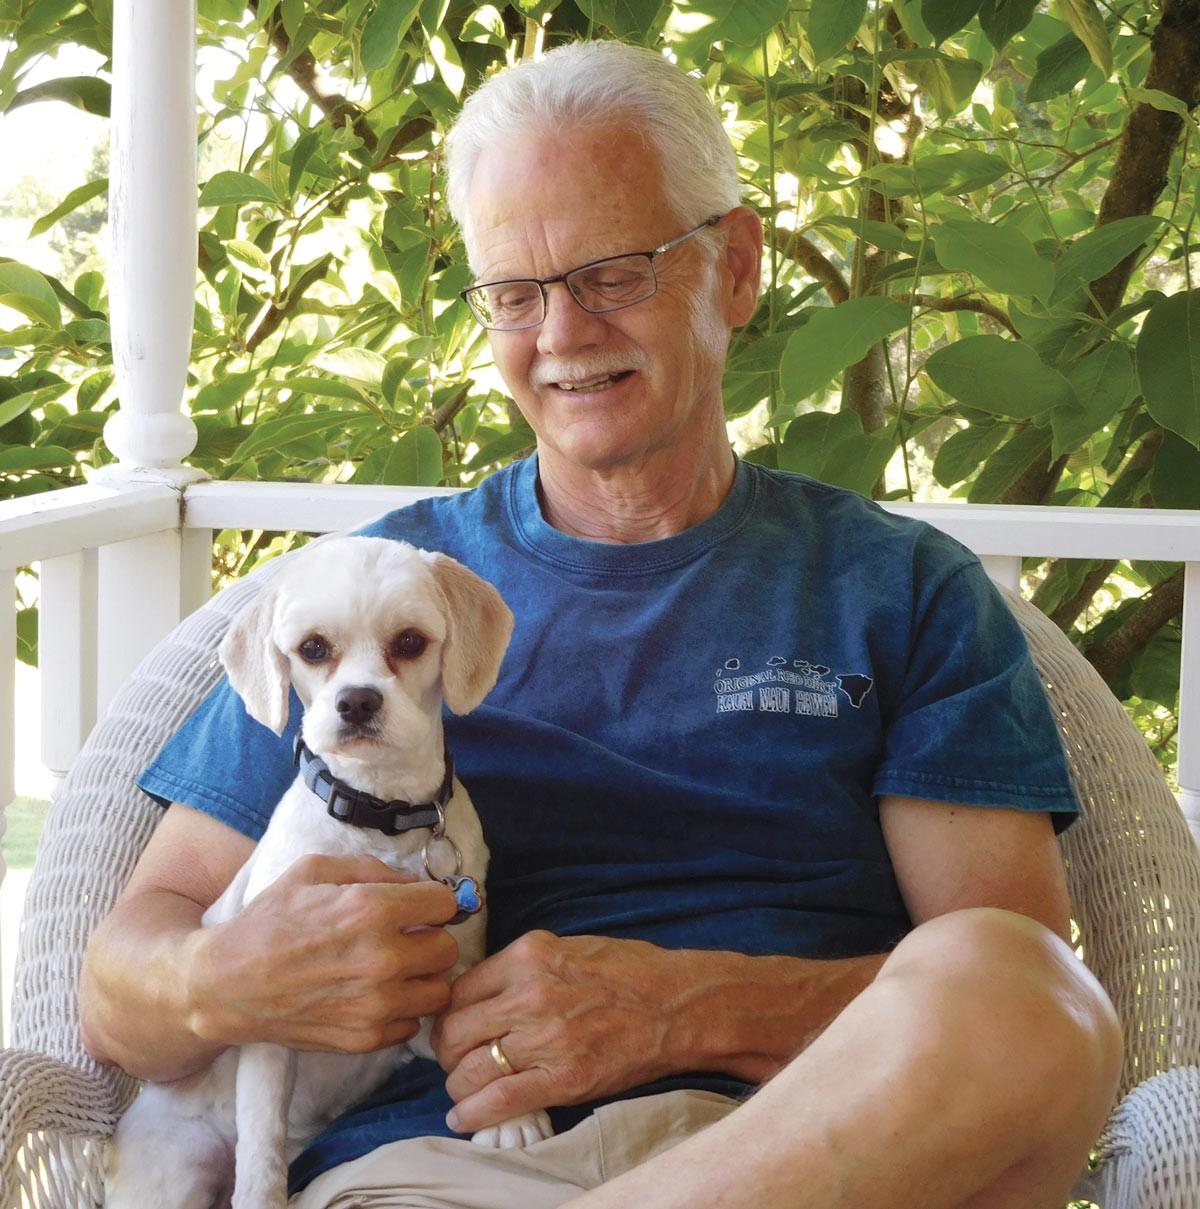 Bob Slack and his canine companion.